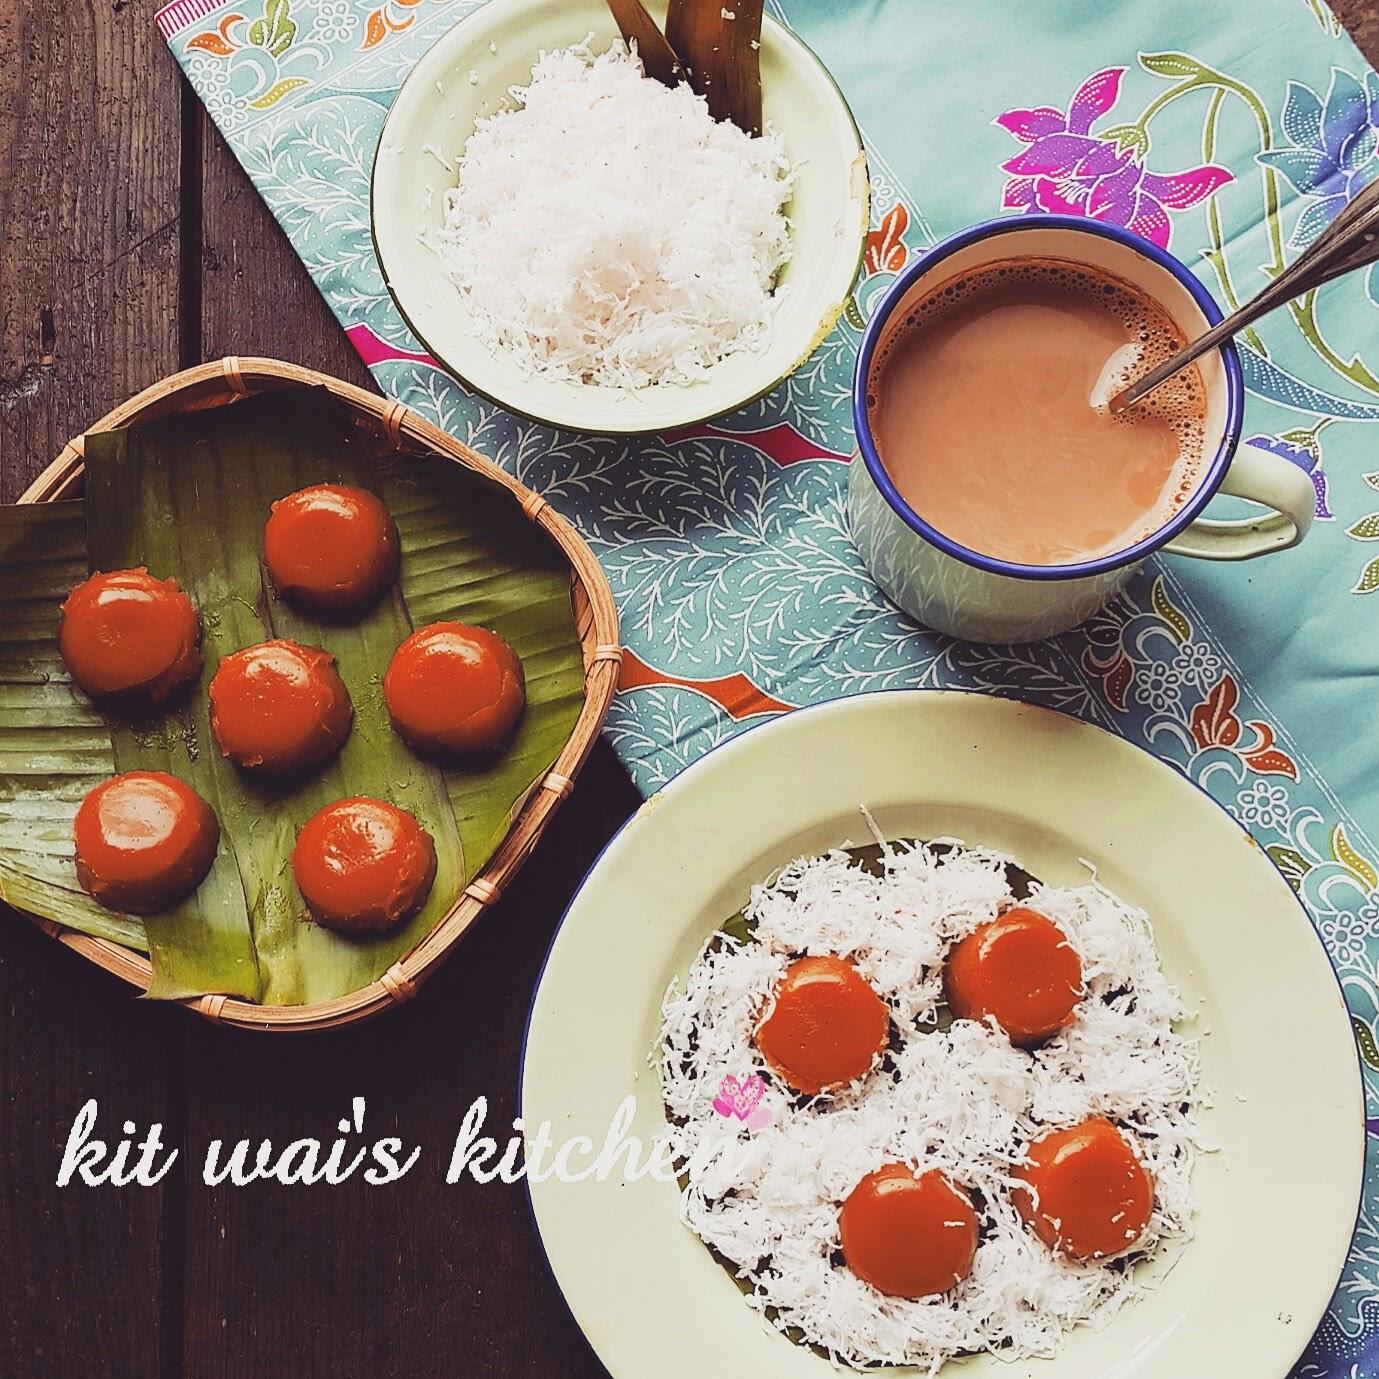 Kit Wai's Kitchen : 椰糖椰丝糕 ( II )~ Gula Melaka Kuih Kosui